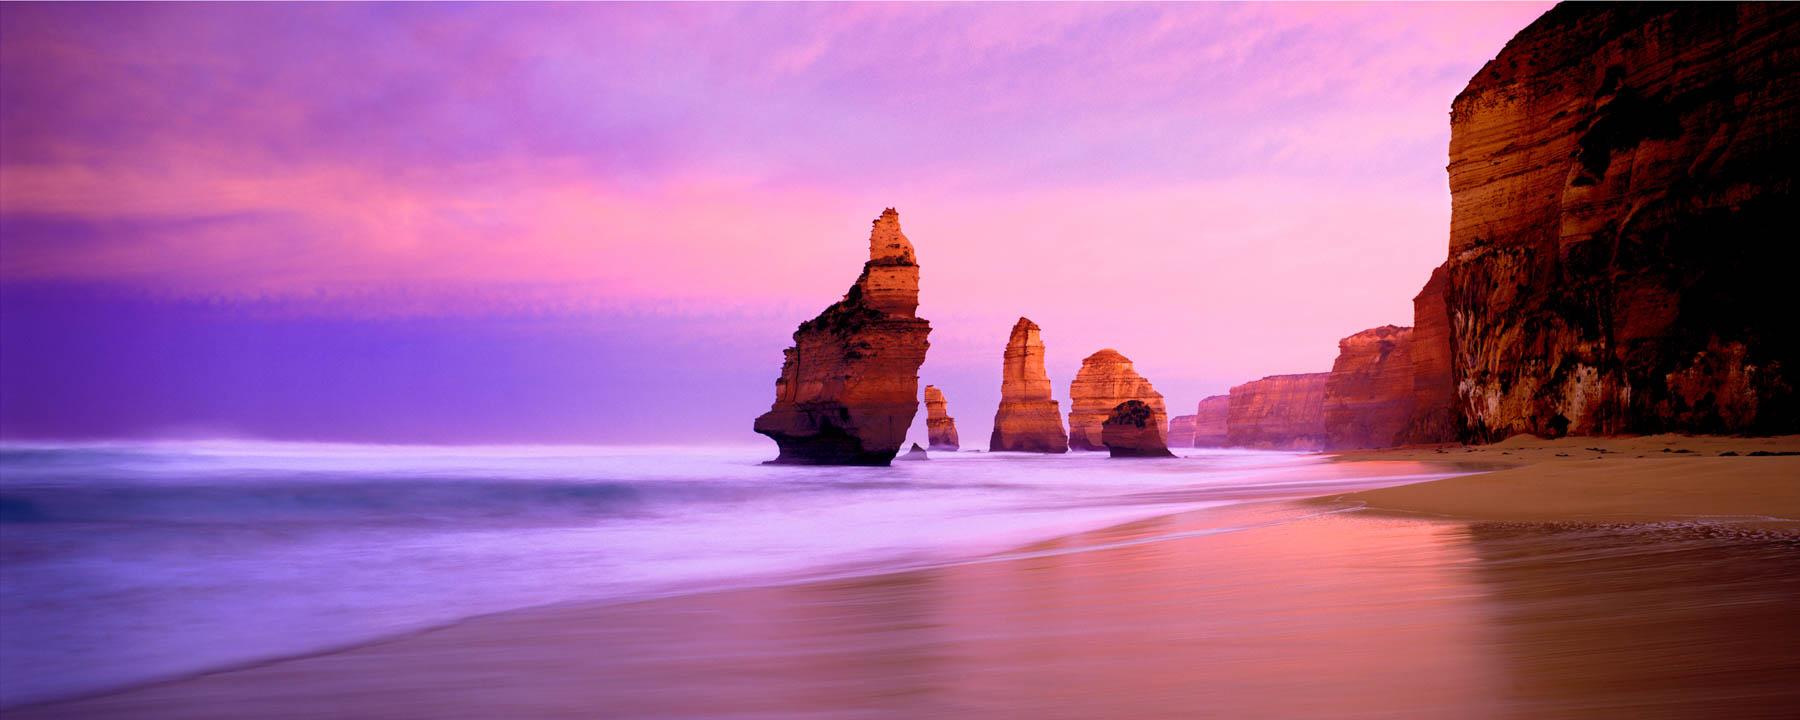 Under Southern Skies, Australia